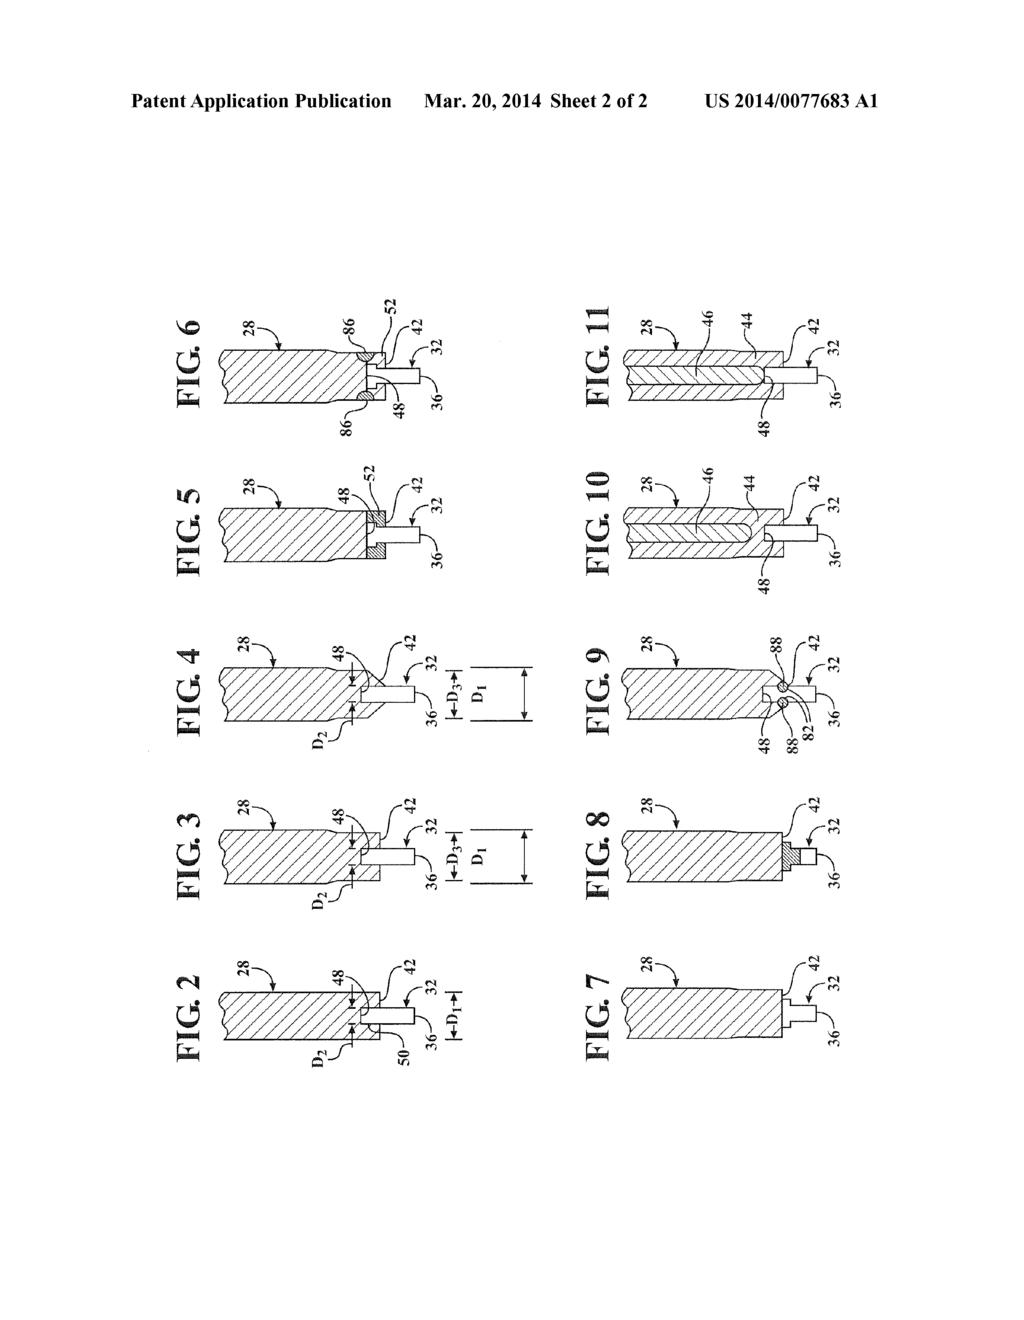 spark plug with ceramic electrode tip diagram, schematic, and image 03 Champion Spark Plug Parts Diagram